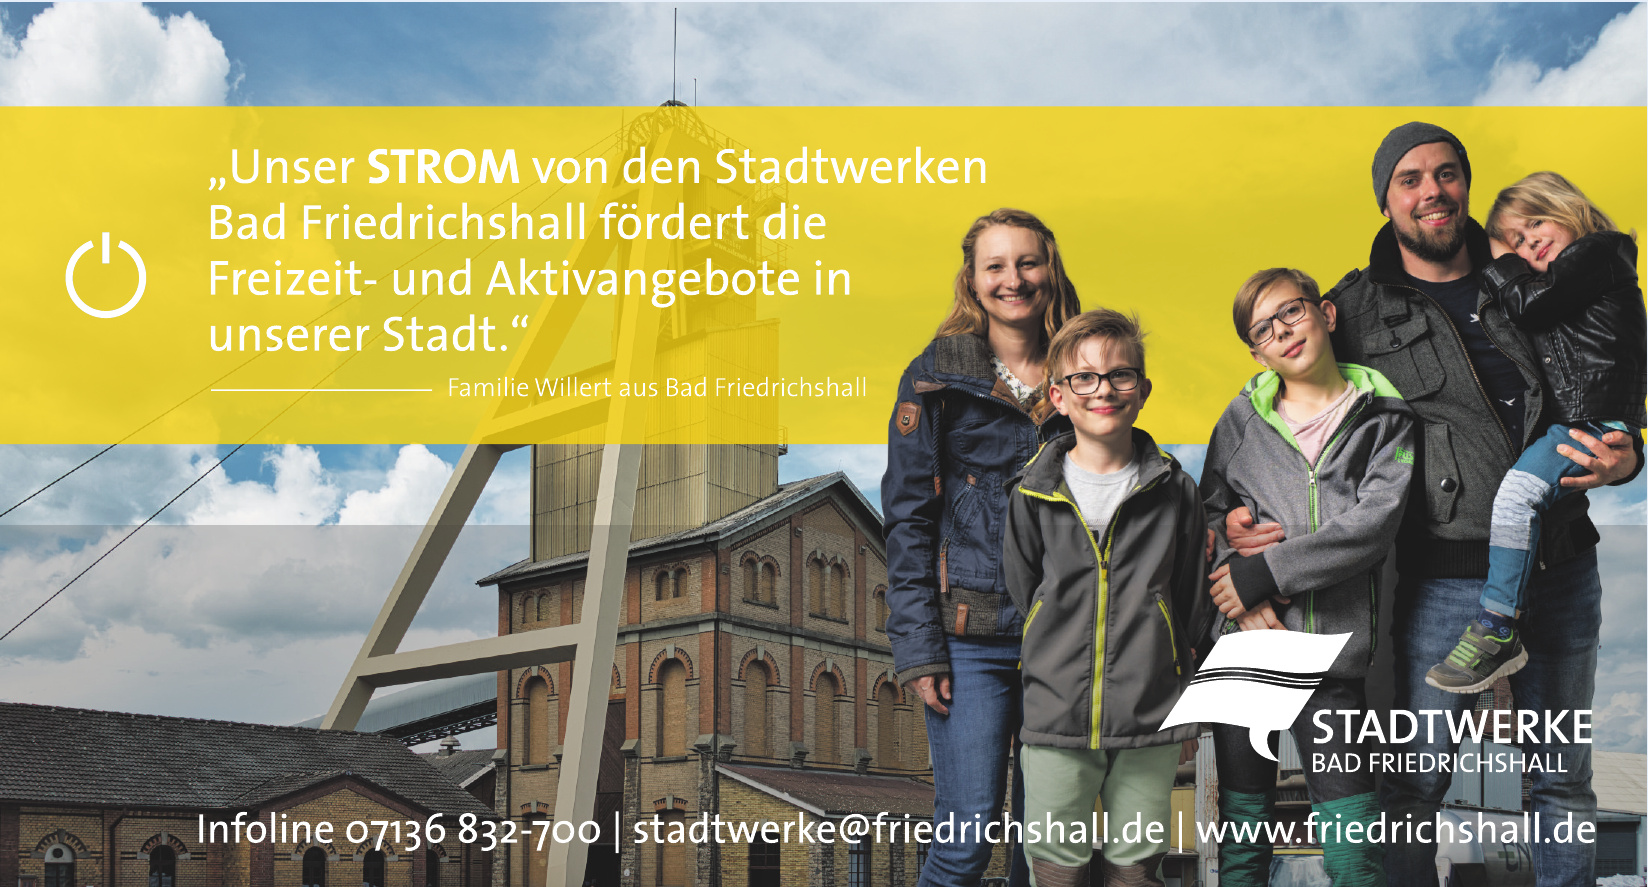 Stadtwerke Bad Friedrichshall